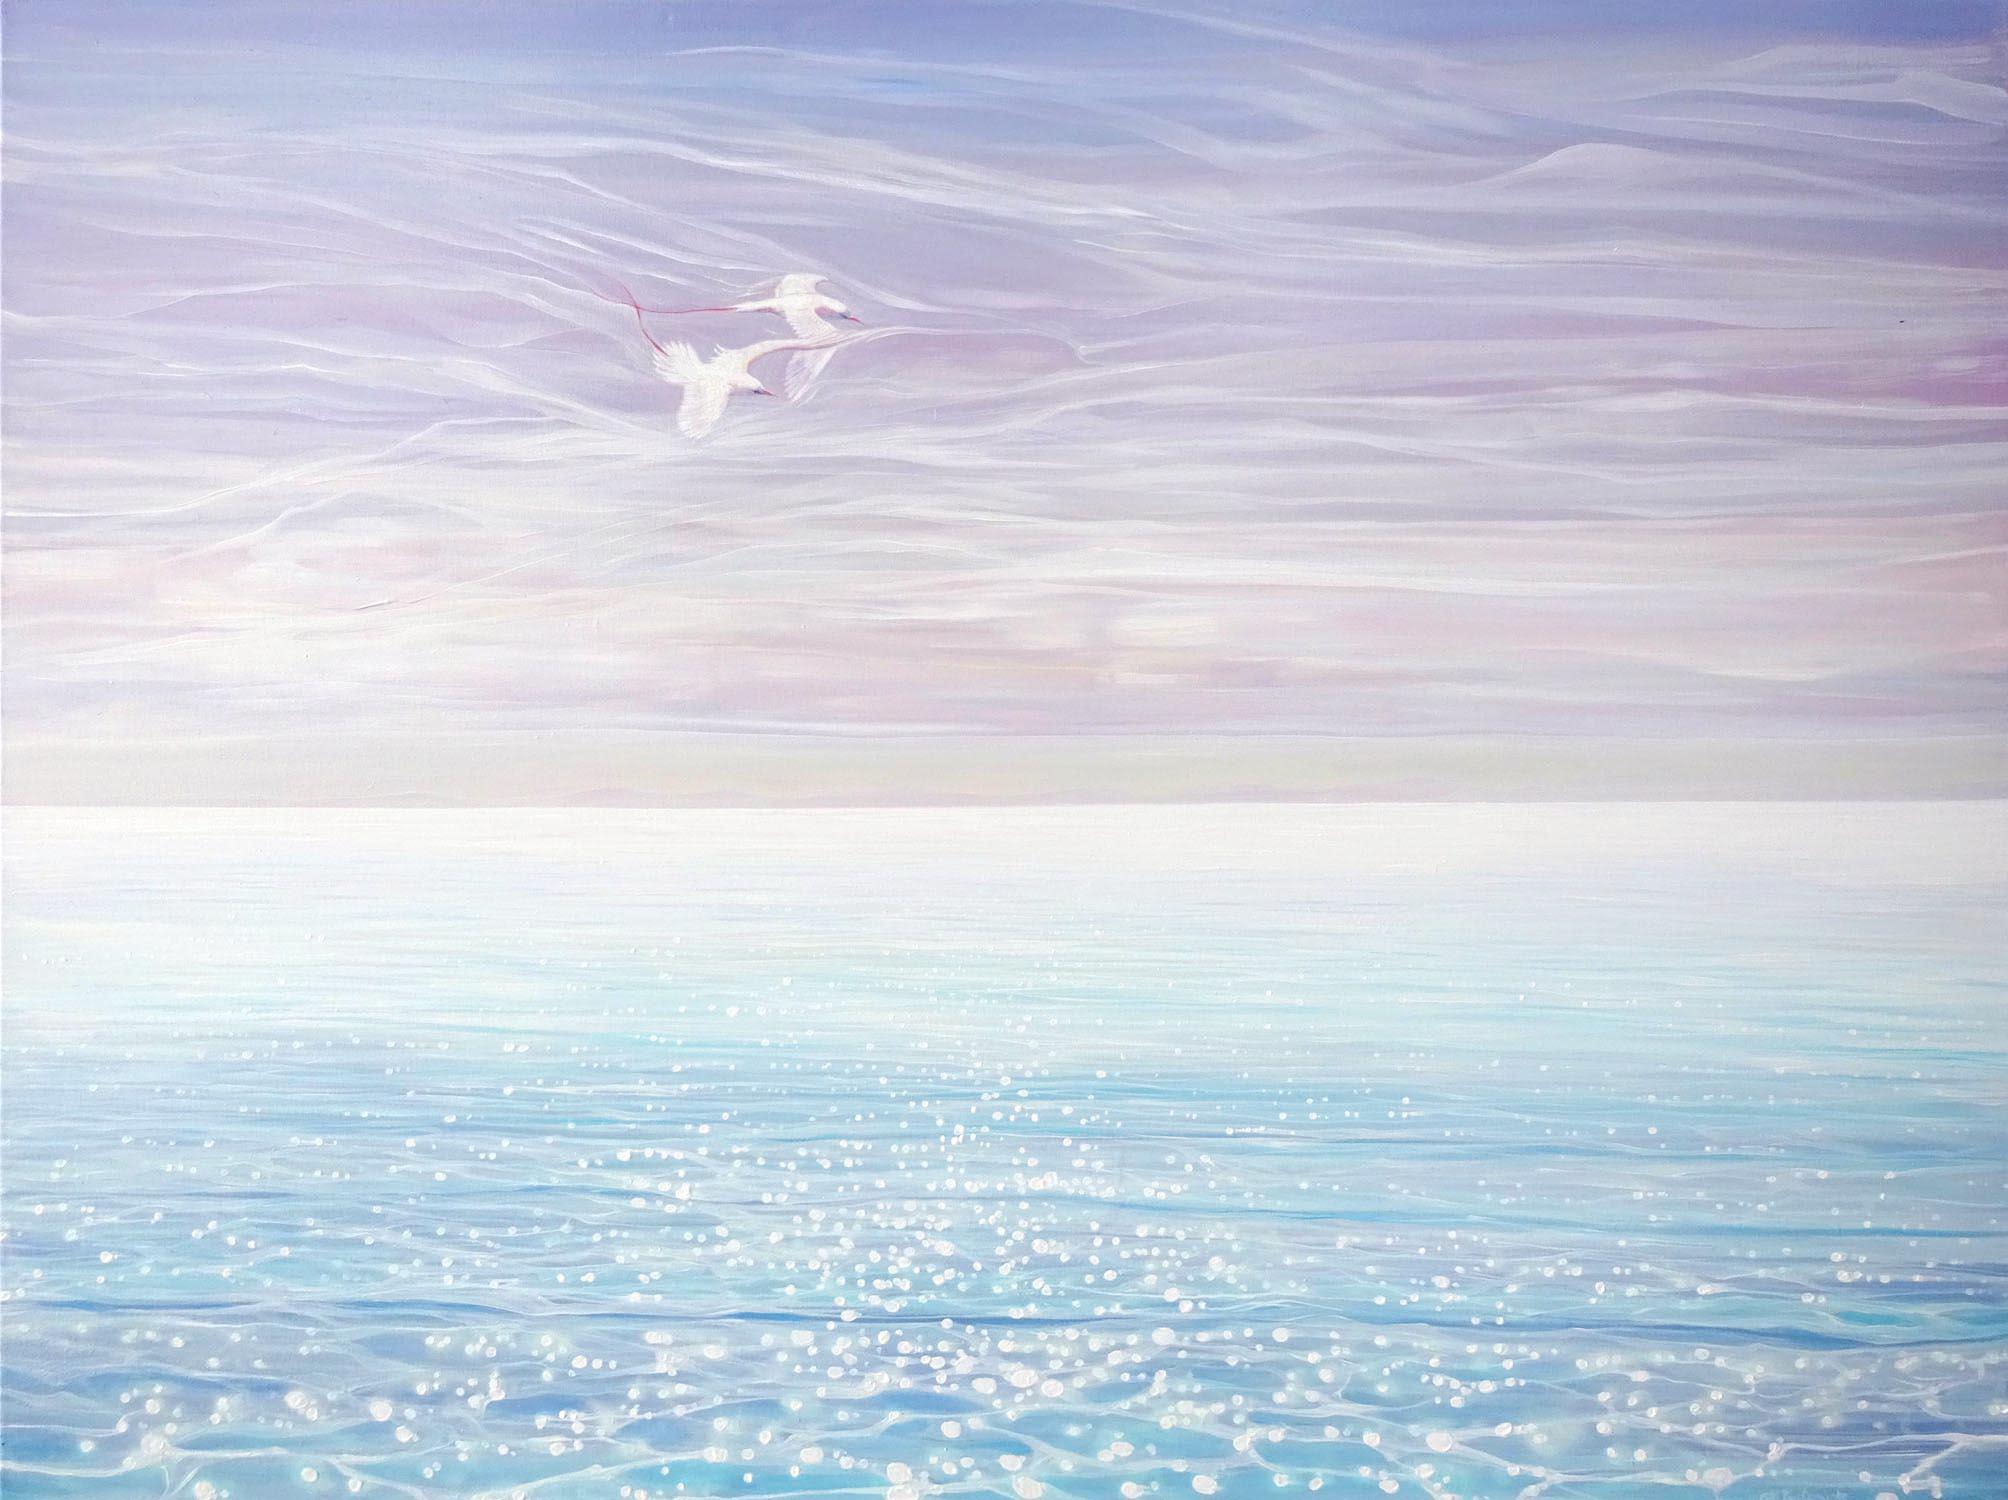 White birds blue sea 72 kuofal